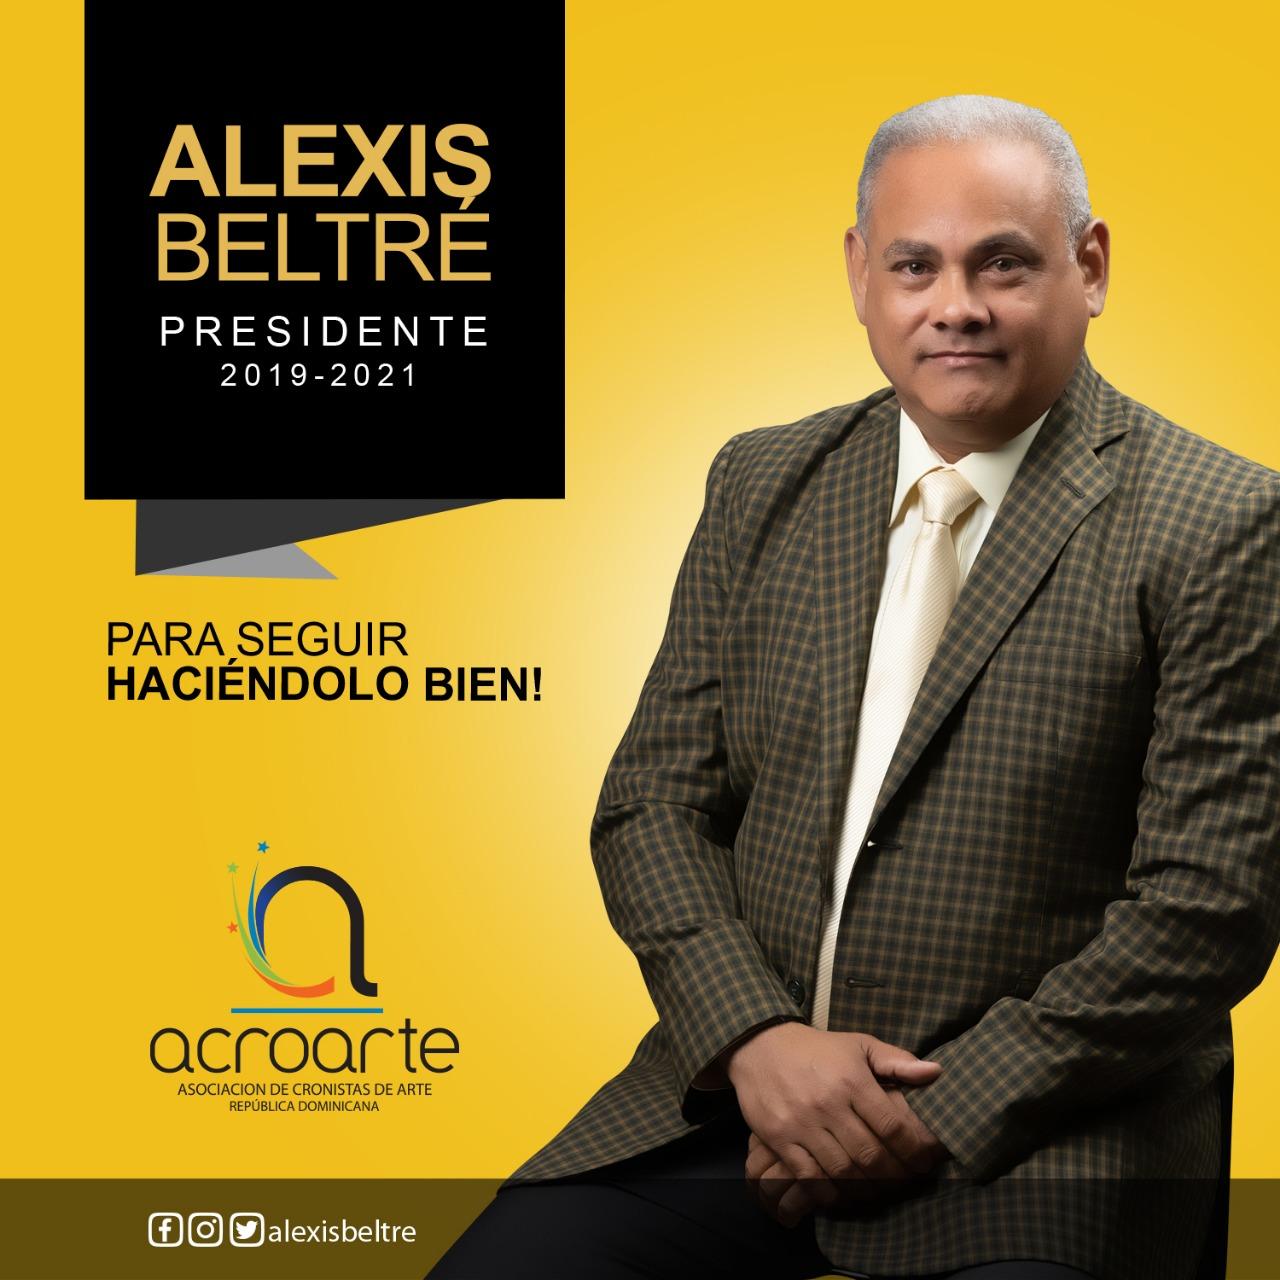 Alexis Beltré presidente de Acroarte